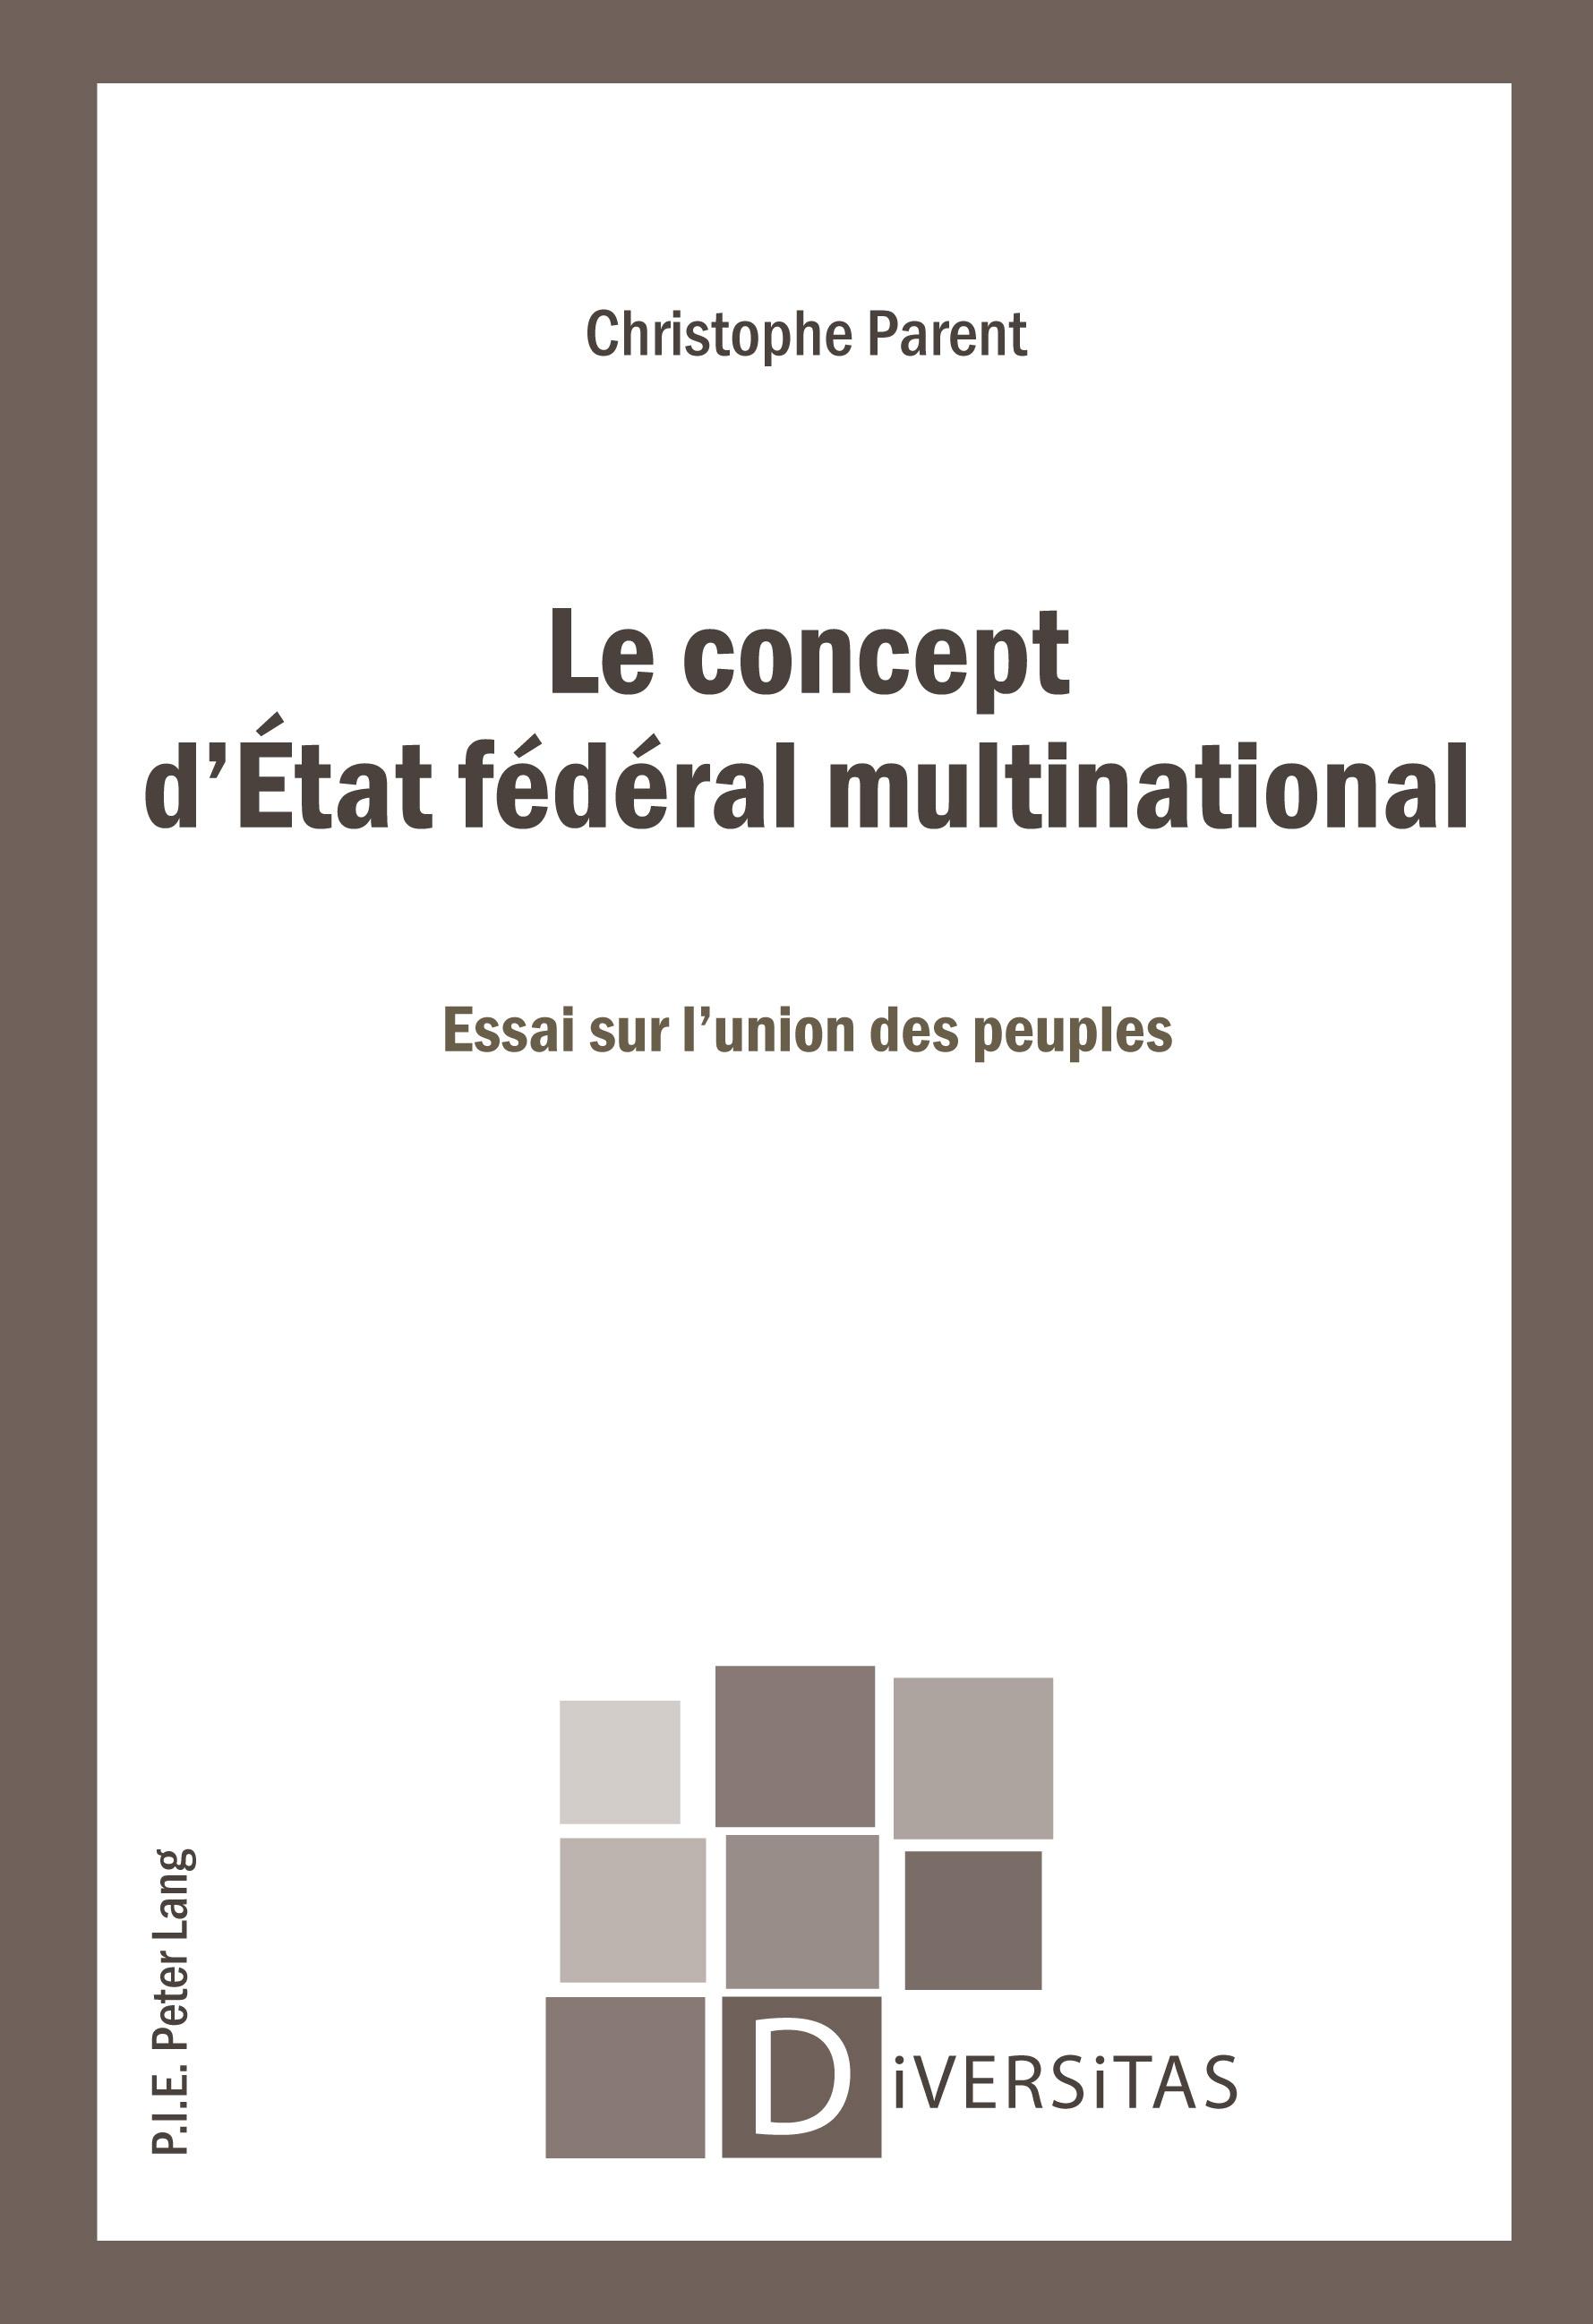 LE CONCEPT D'ETAT FEDERAL MULTINATIONAL